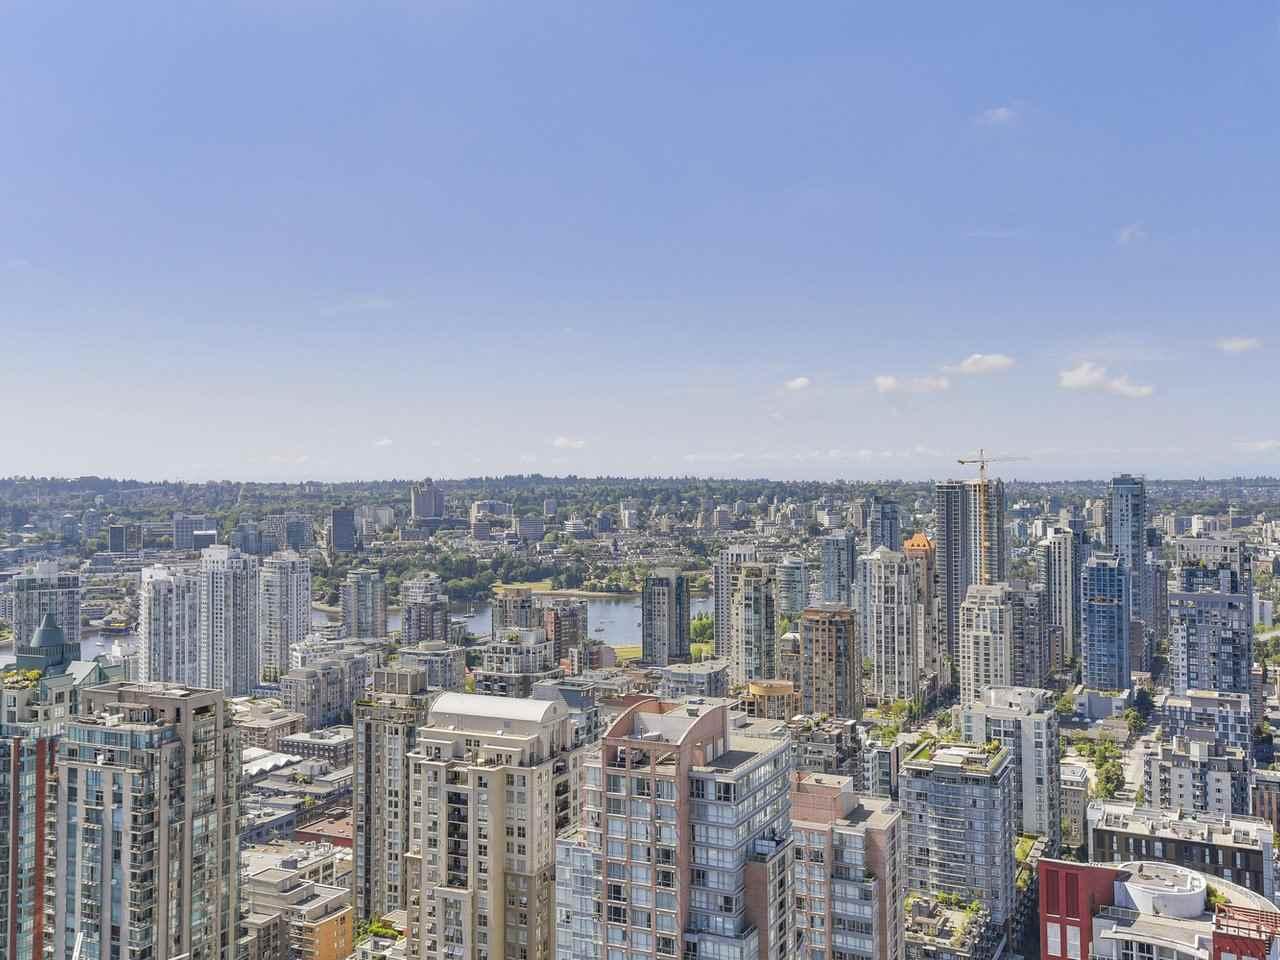 Condo Apartment at PH3 833 SEYMOUR STREET, Unit PH3, Vancouver West, British Columbia. Image 20